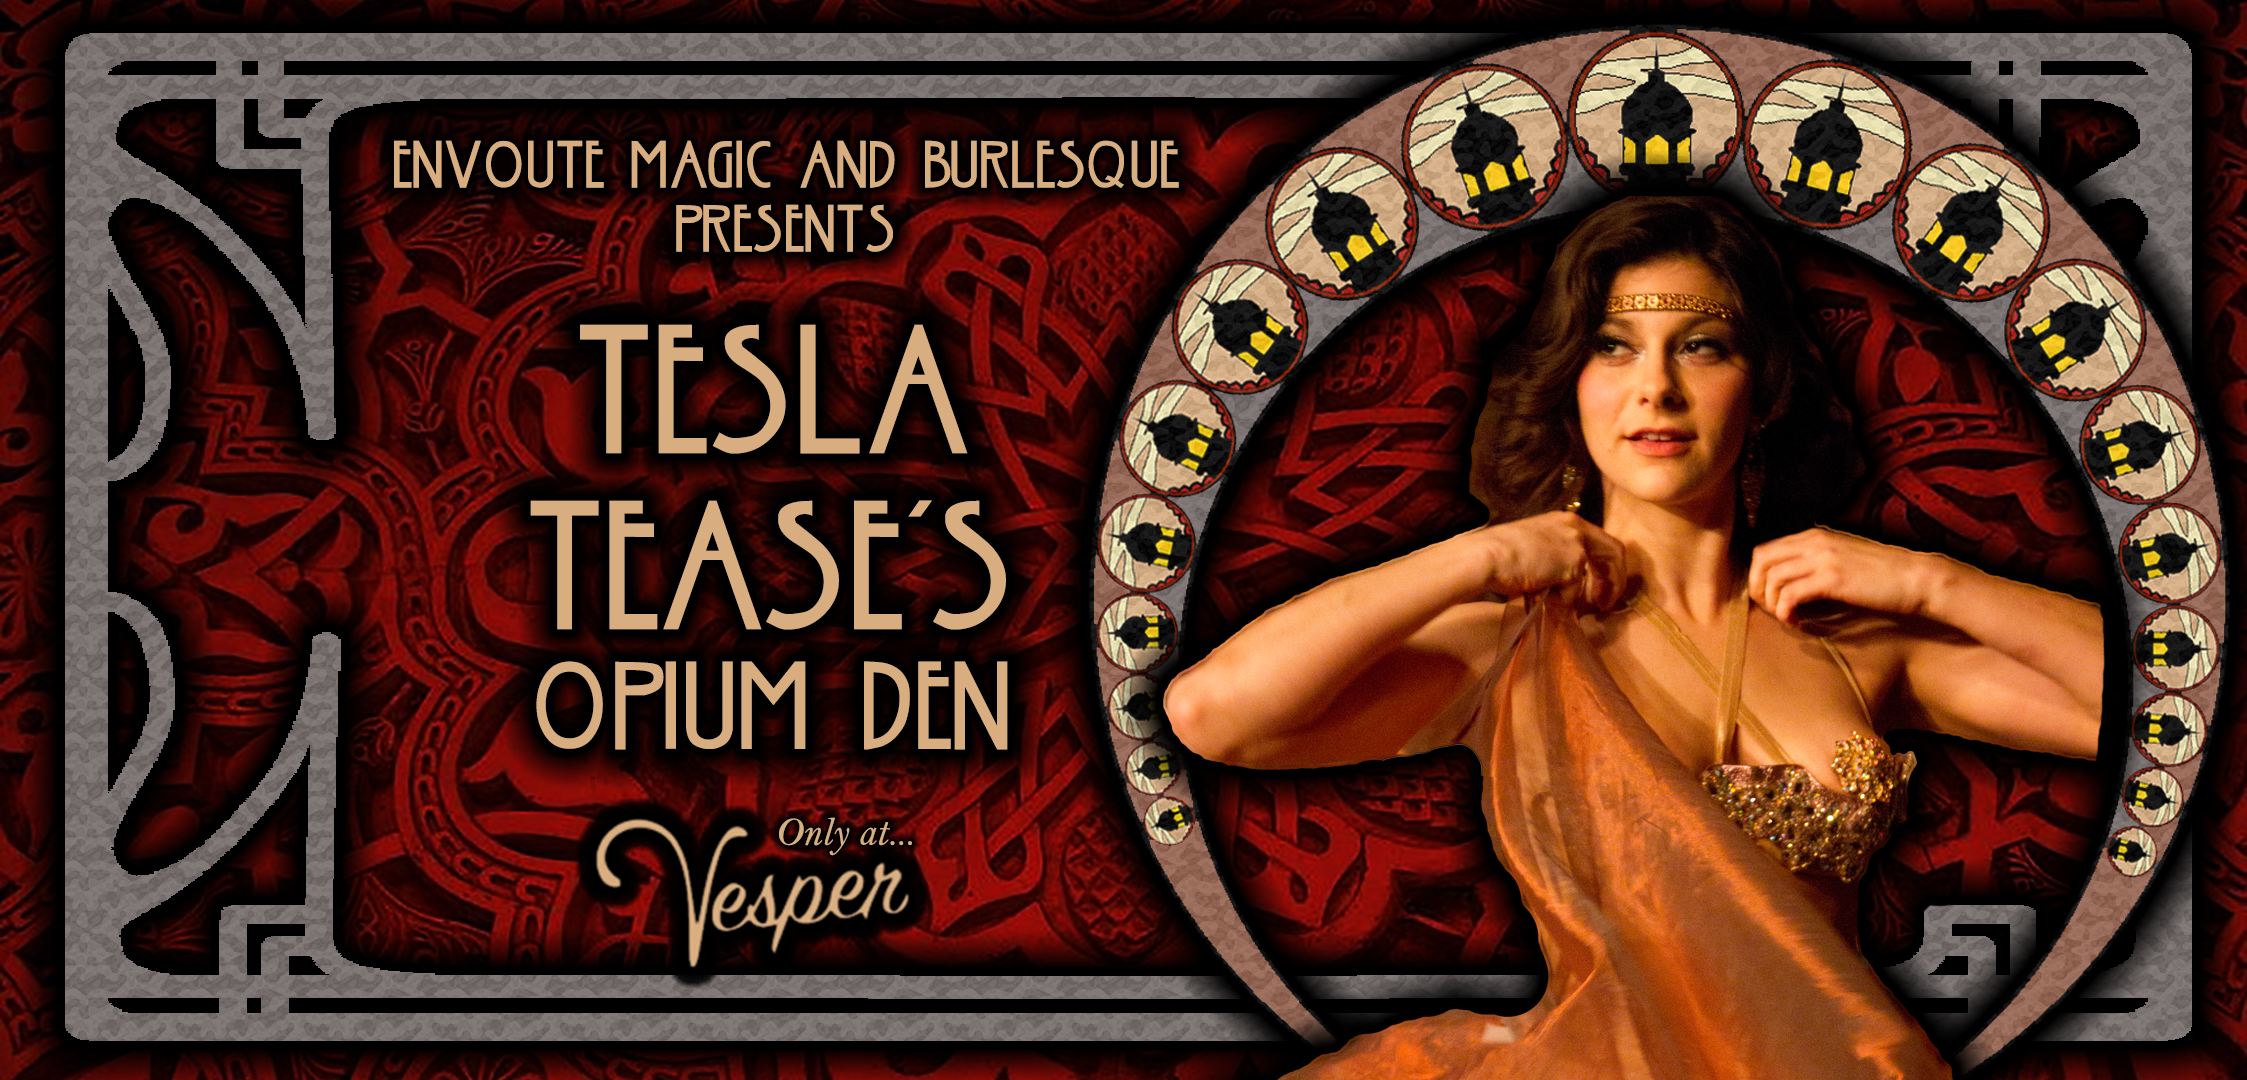 Envoute Burlesque presents Tesla Tease's Opiu